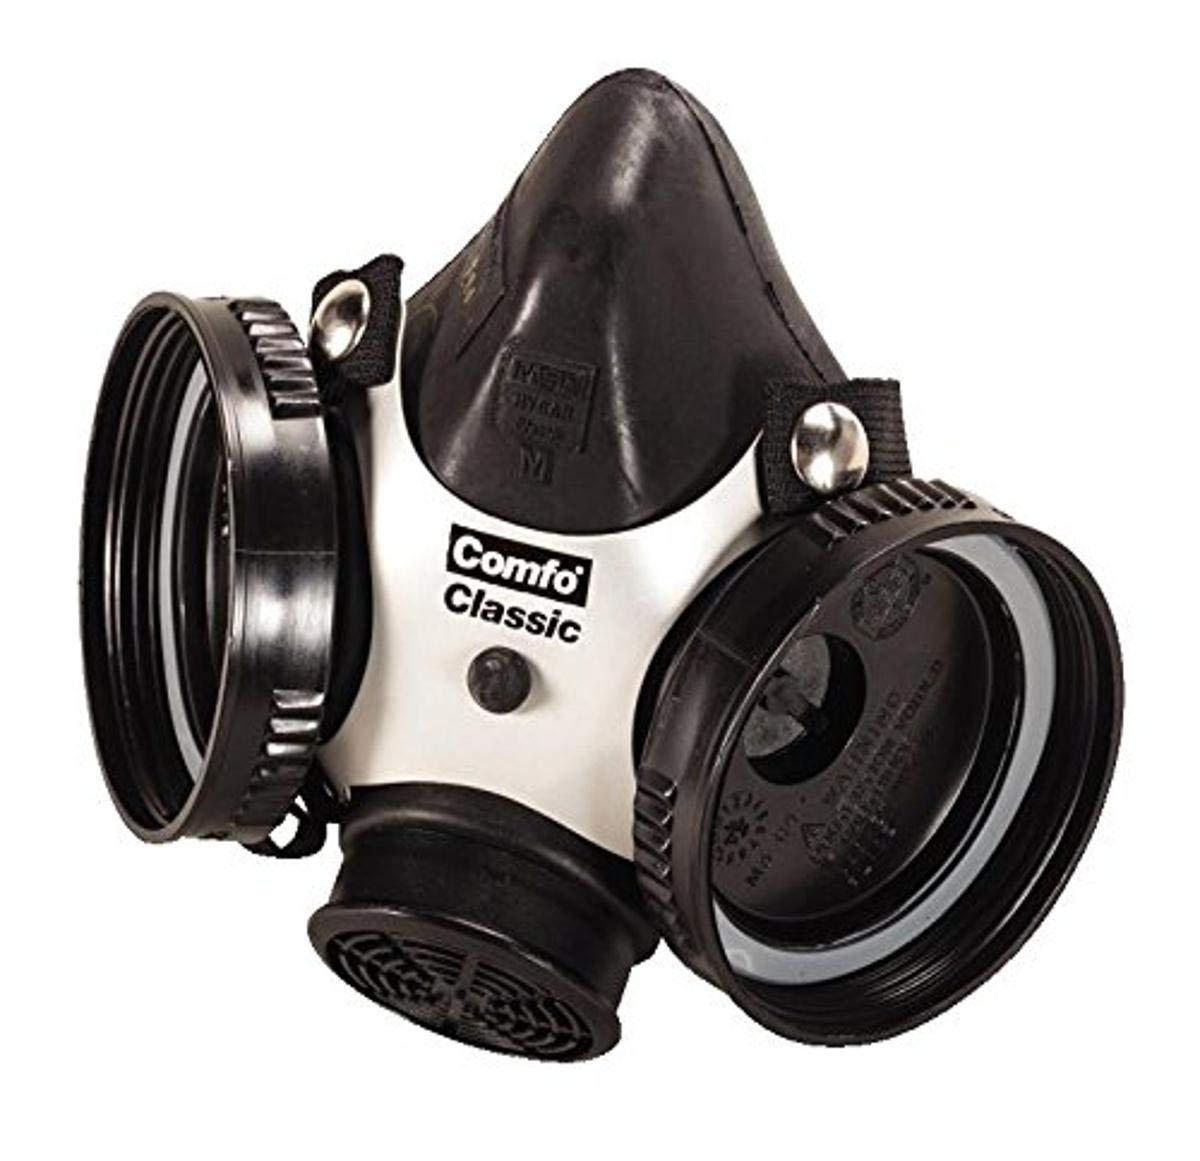 MSA 808061 Comfo Classic Respirator Half-Mask New product!! Large cheap Facepiece